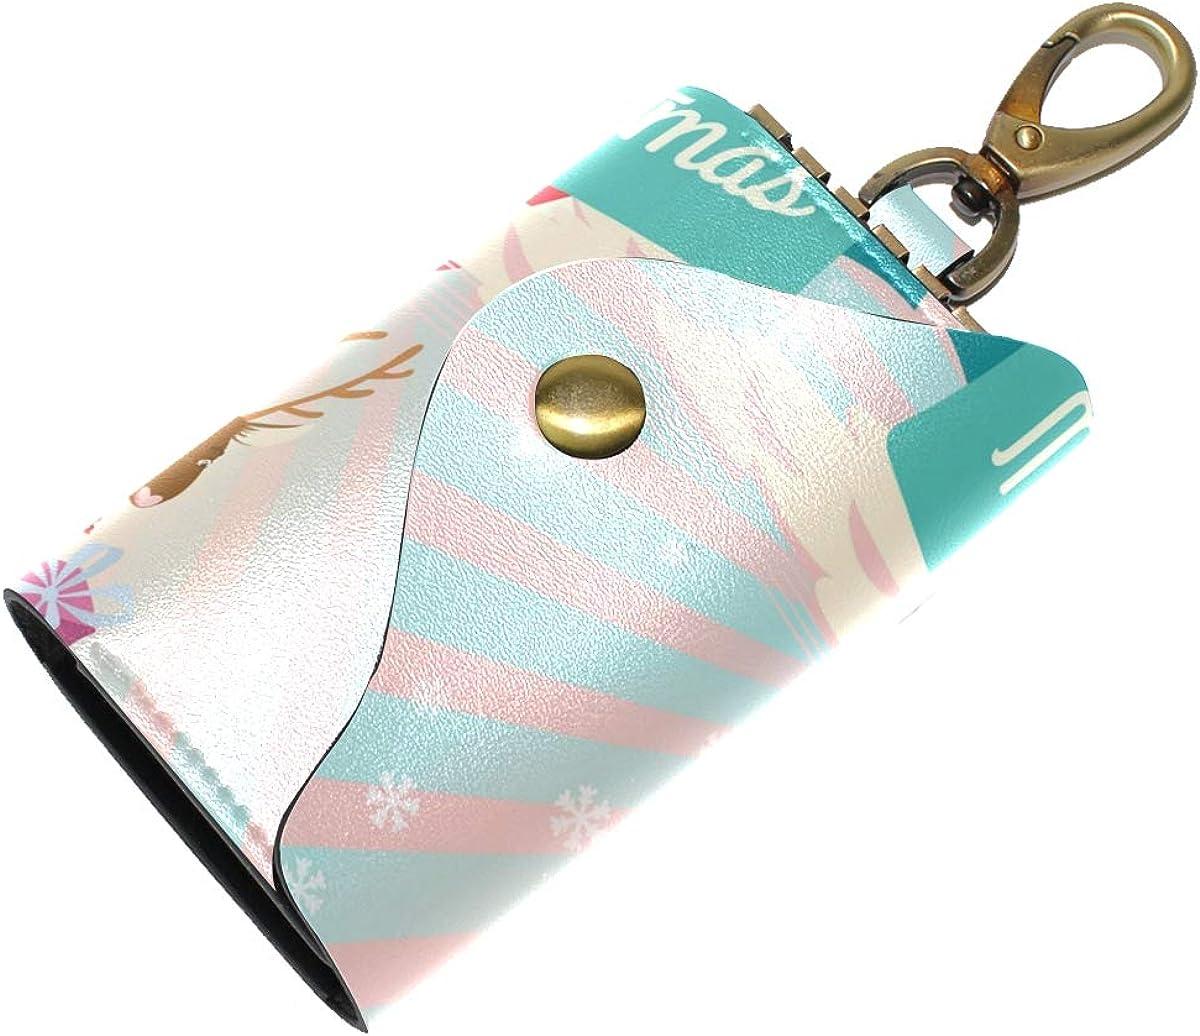 KEAKIA Wave Leather Key Case Wallets Tri-fold Key Holder Keychains with 6 Hooks 2 Slot Snap Closure for Men Women